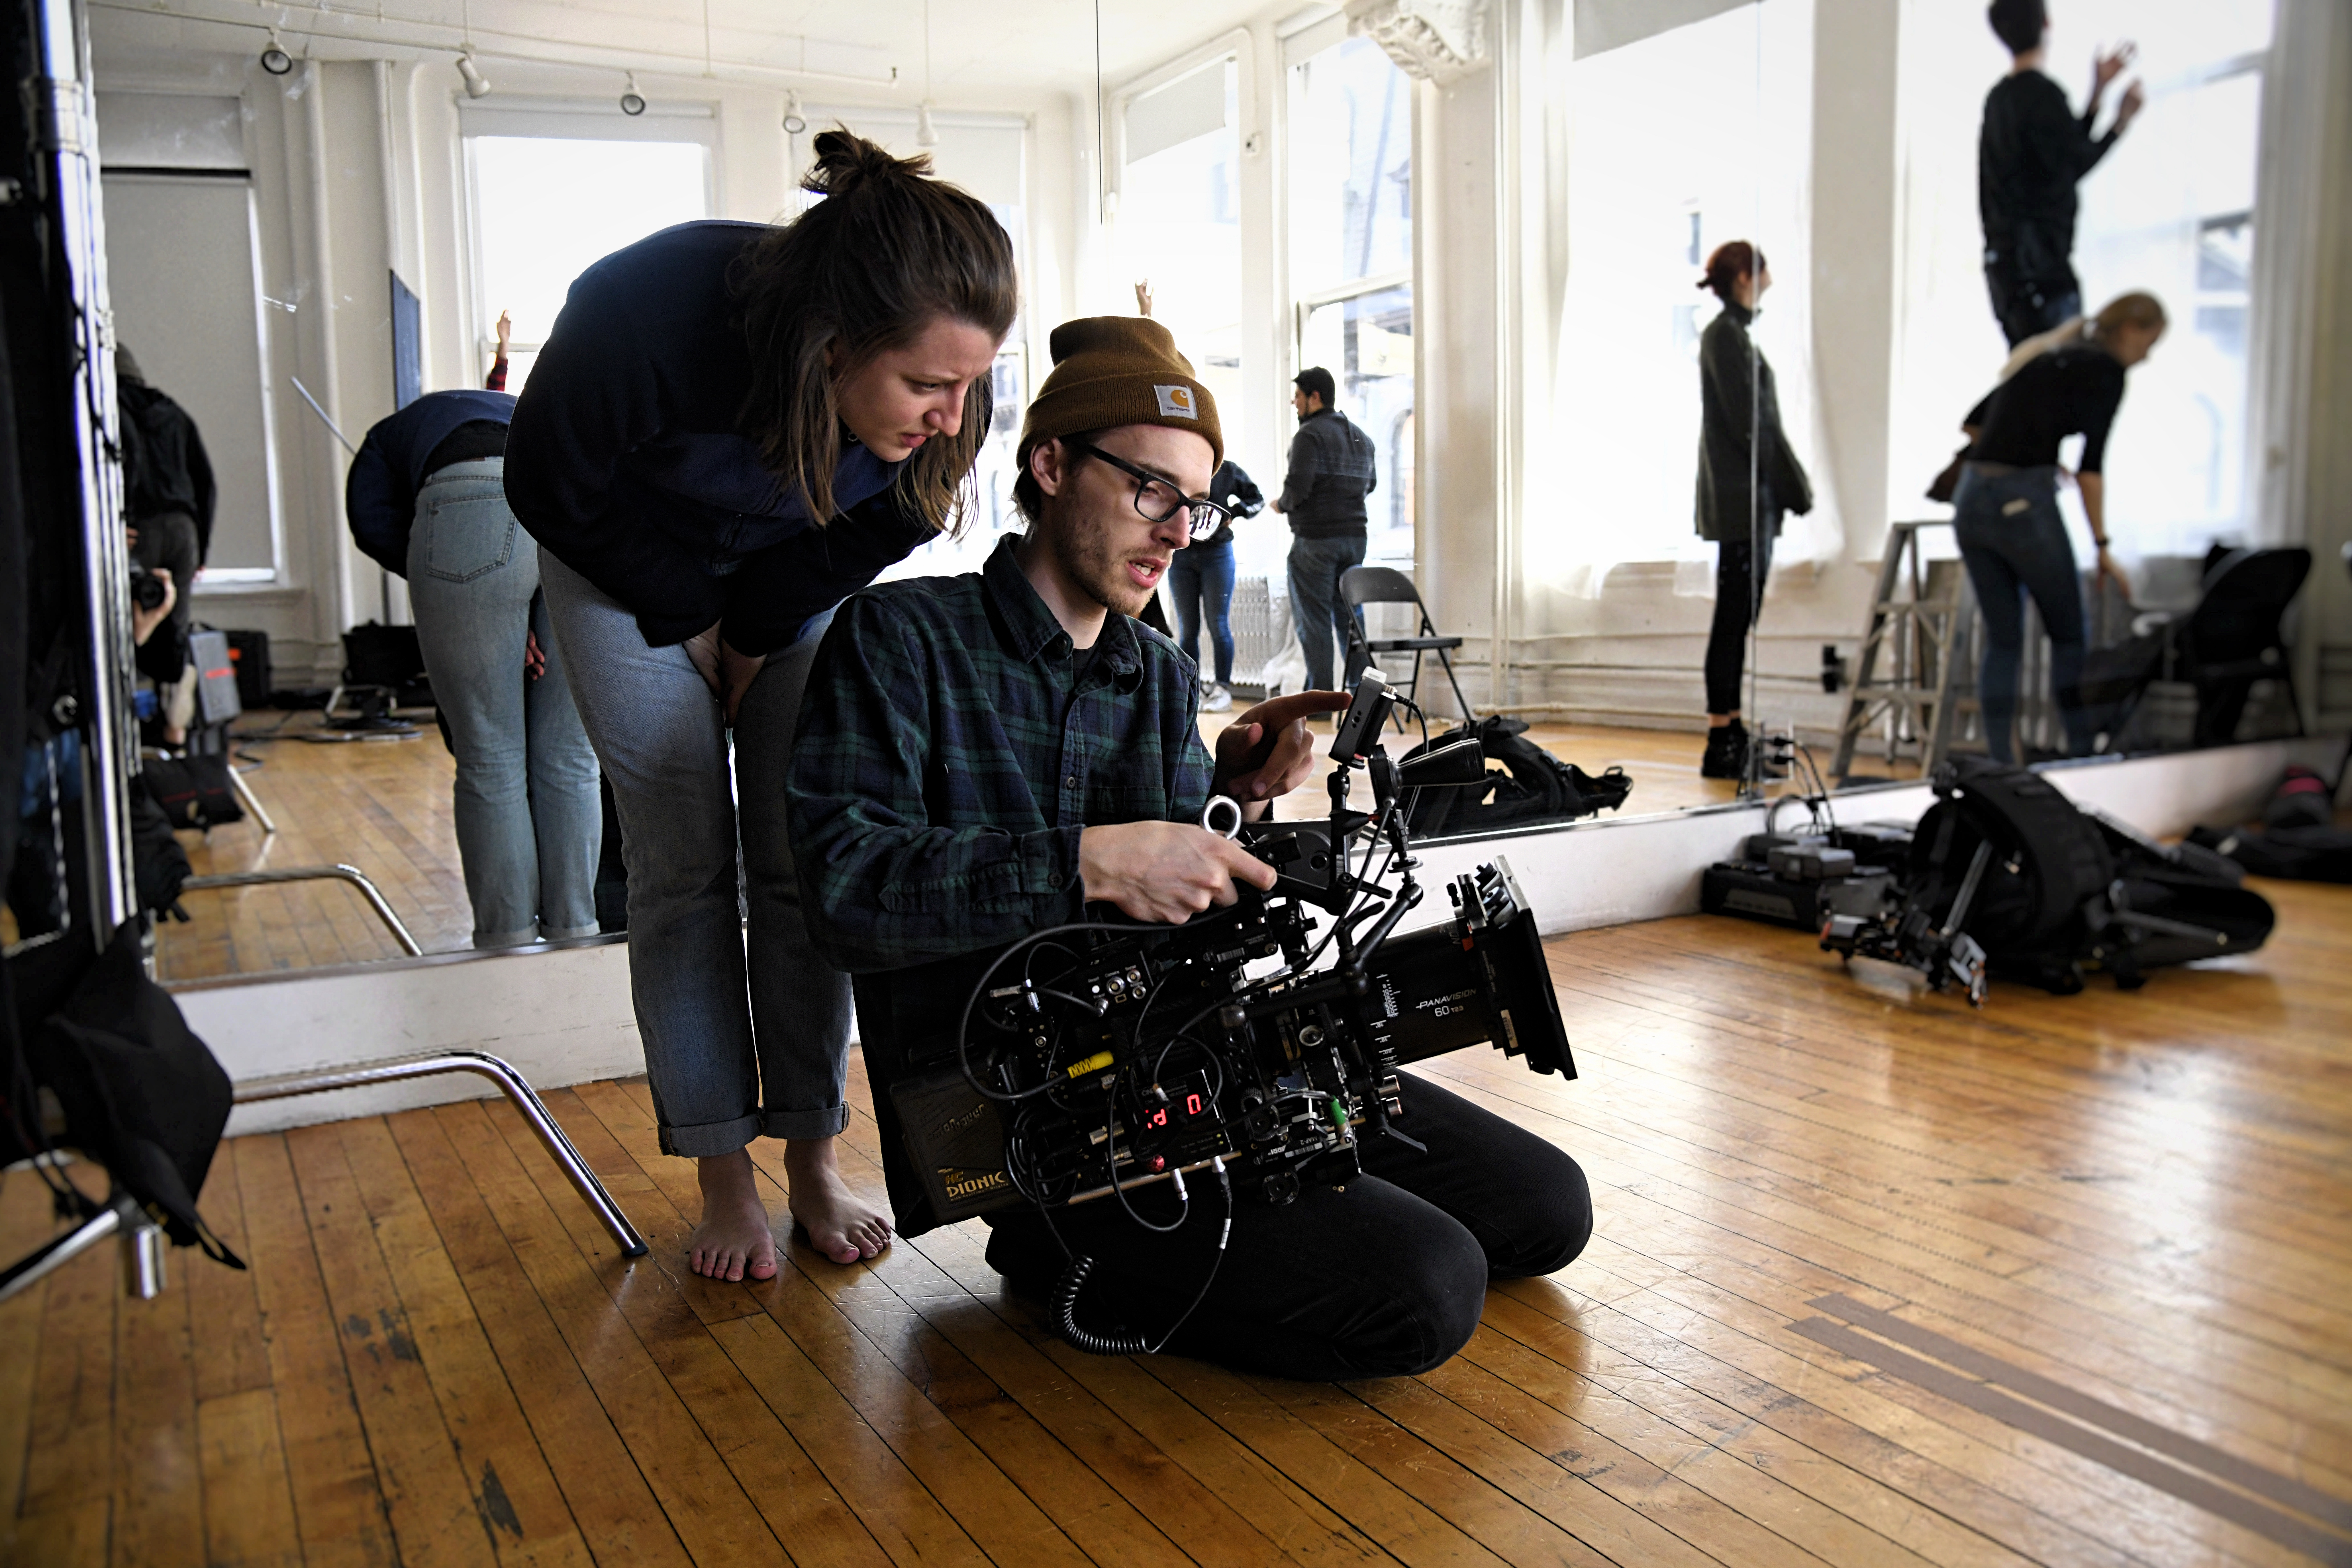 videographer inspecting equipment